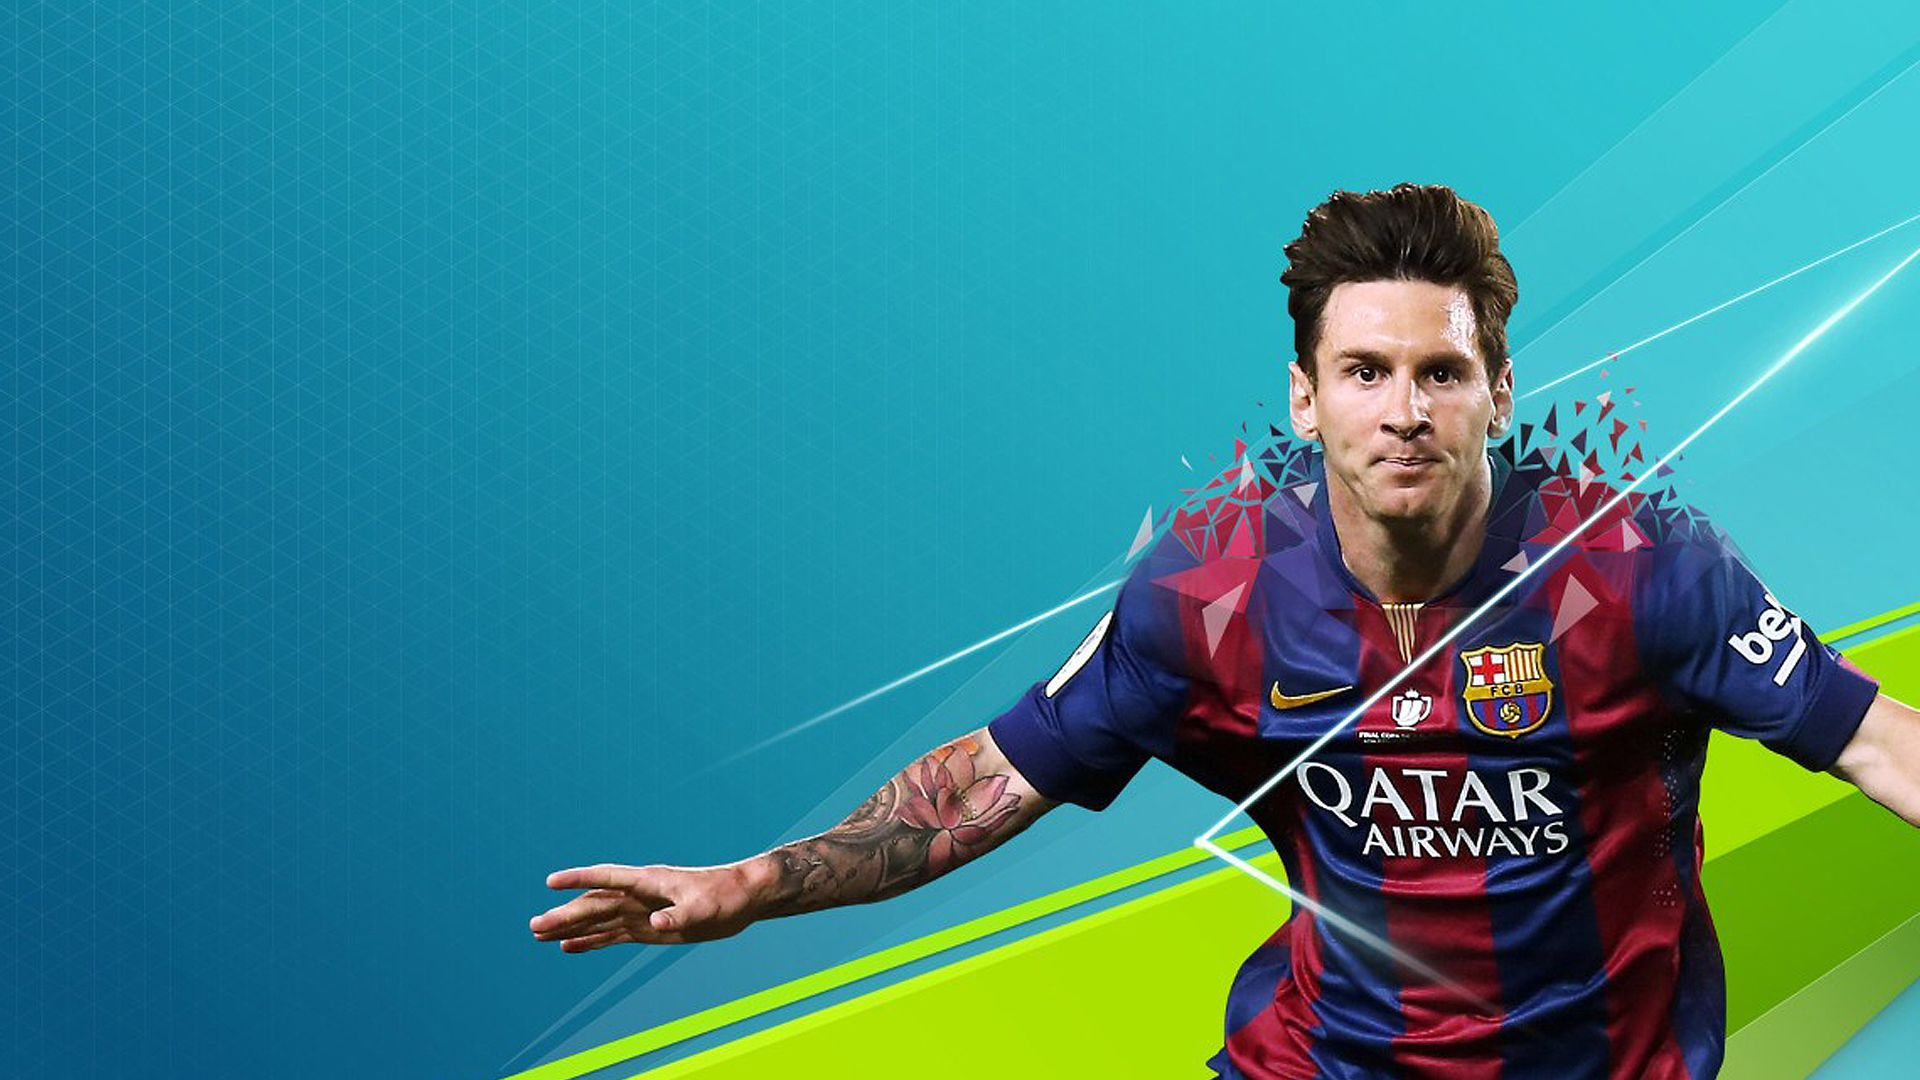 Fifa Wallpaper 1920x1080 Fifa Lionel Messi Fifa 16